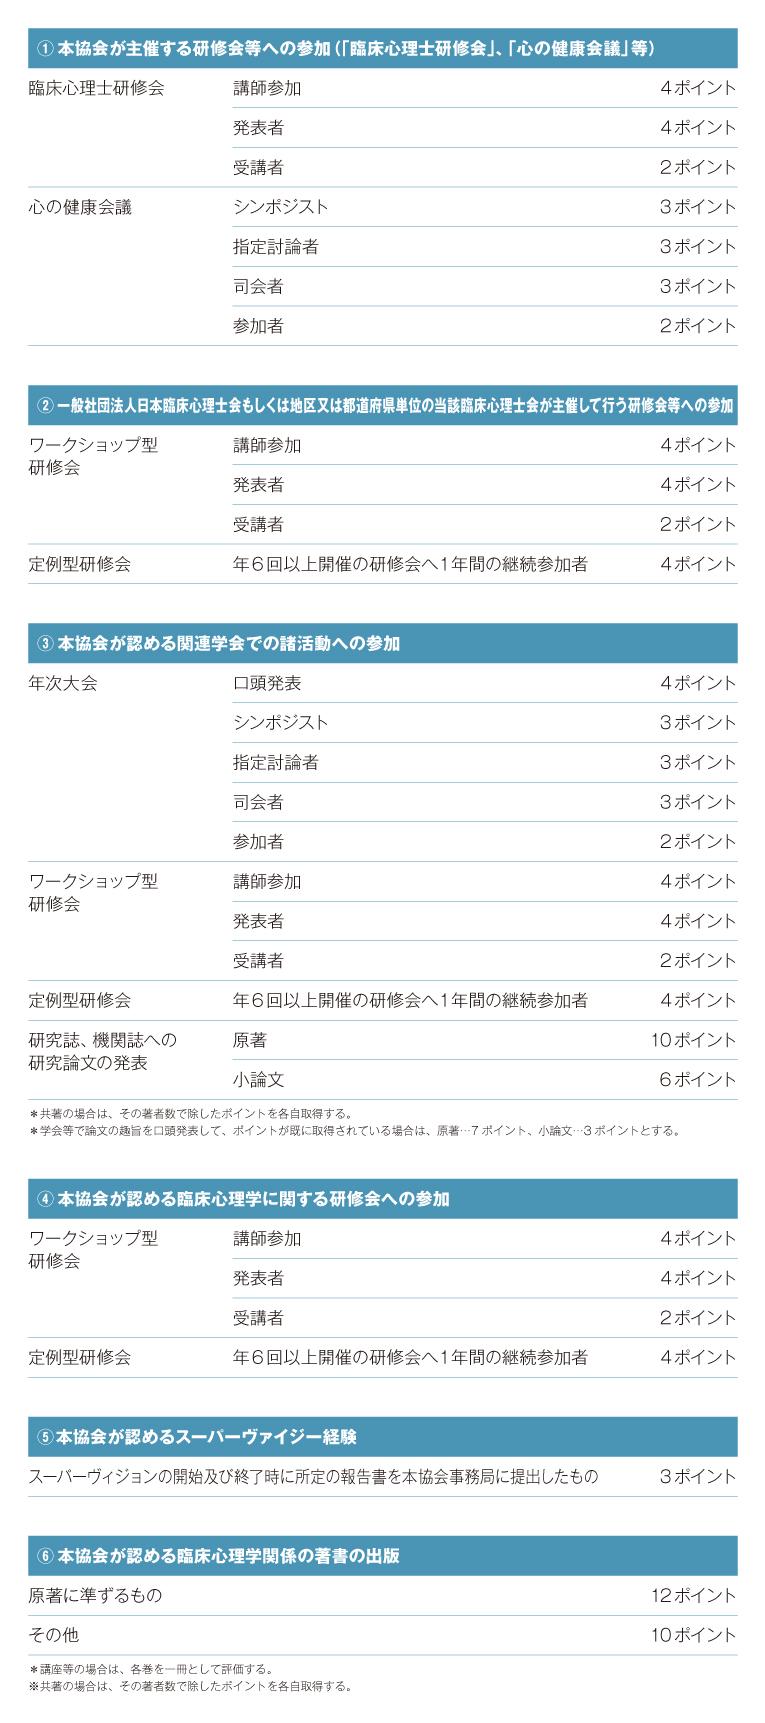 ccp_chart_03_3.20